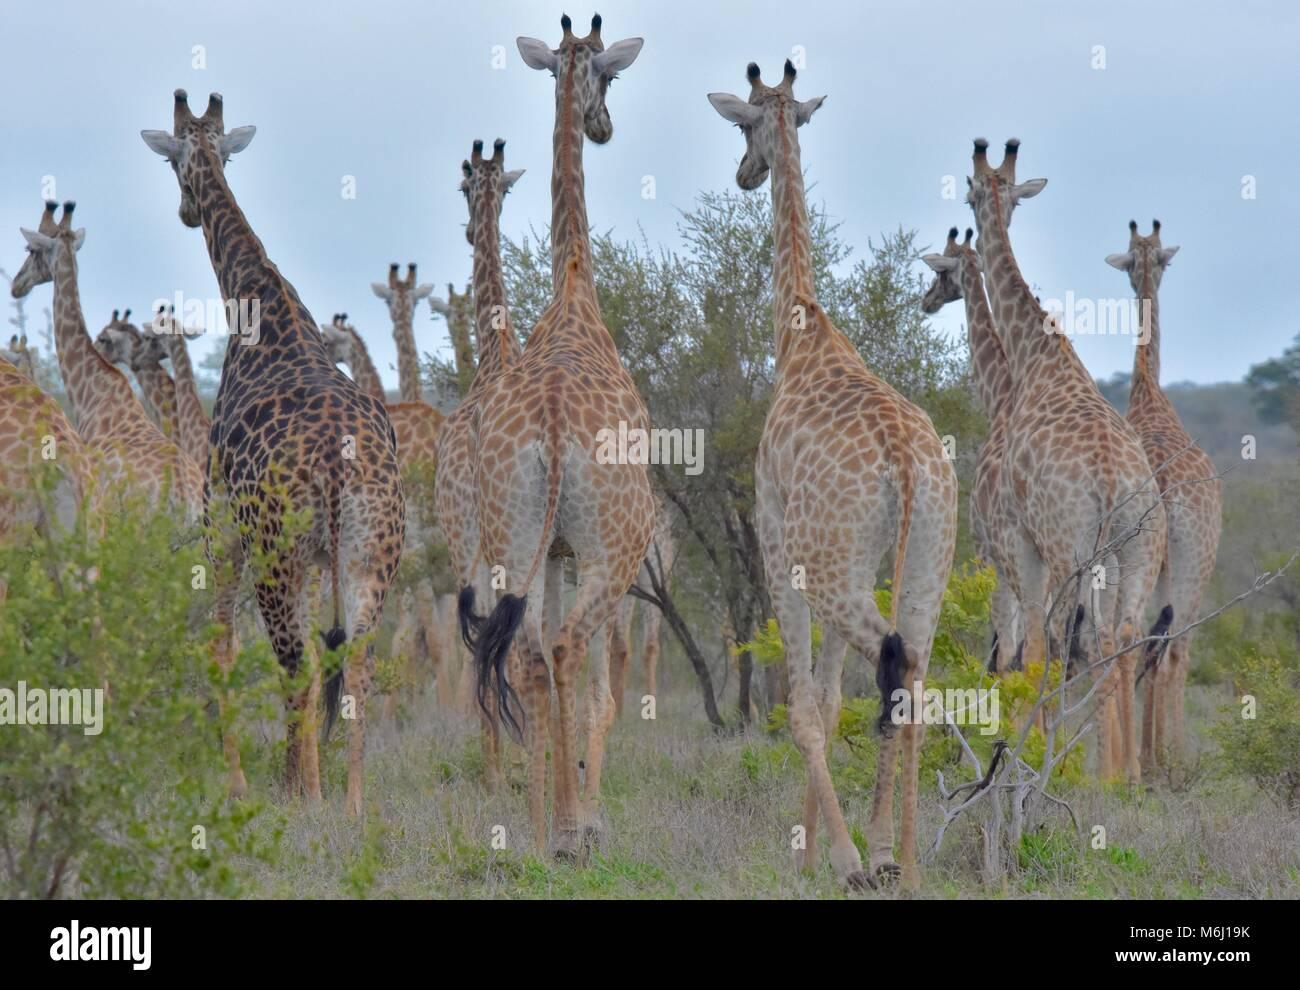 Parque Nacional Kruger, Sudáfrica. Un paraíso de aves y vida silvestre. Manada de jirafas desde atrás. Imagen De Stock